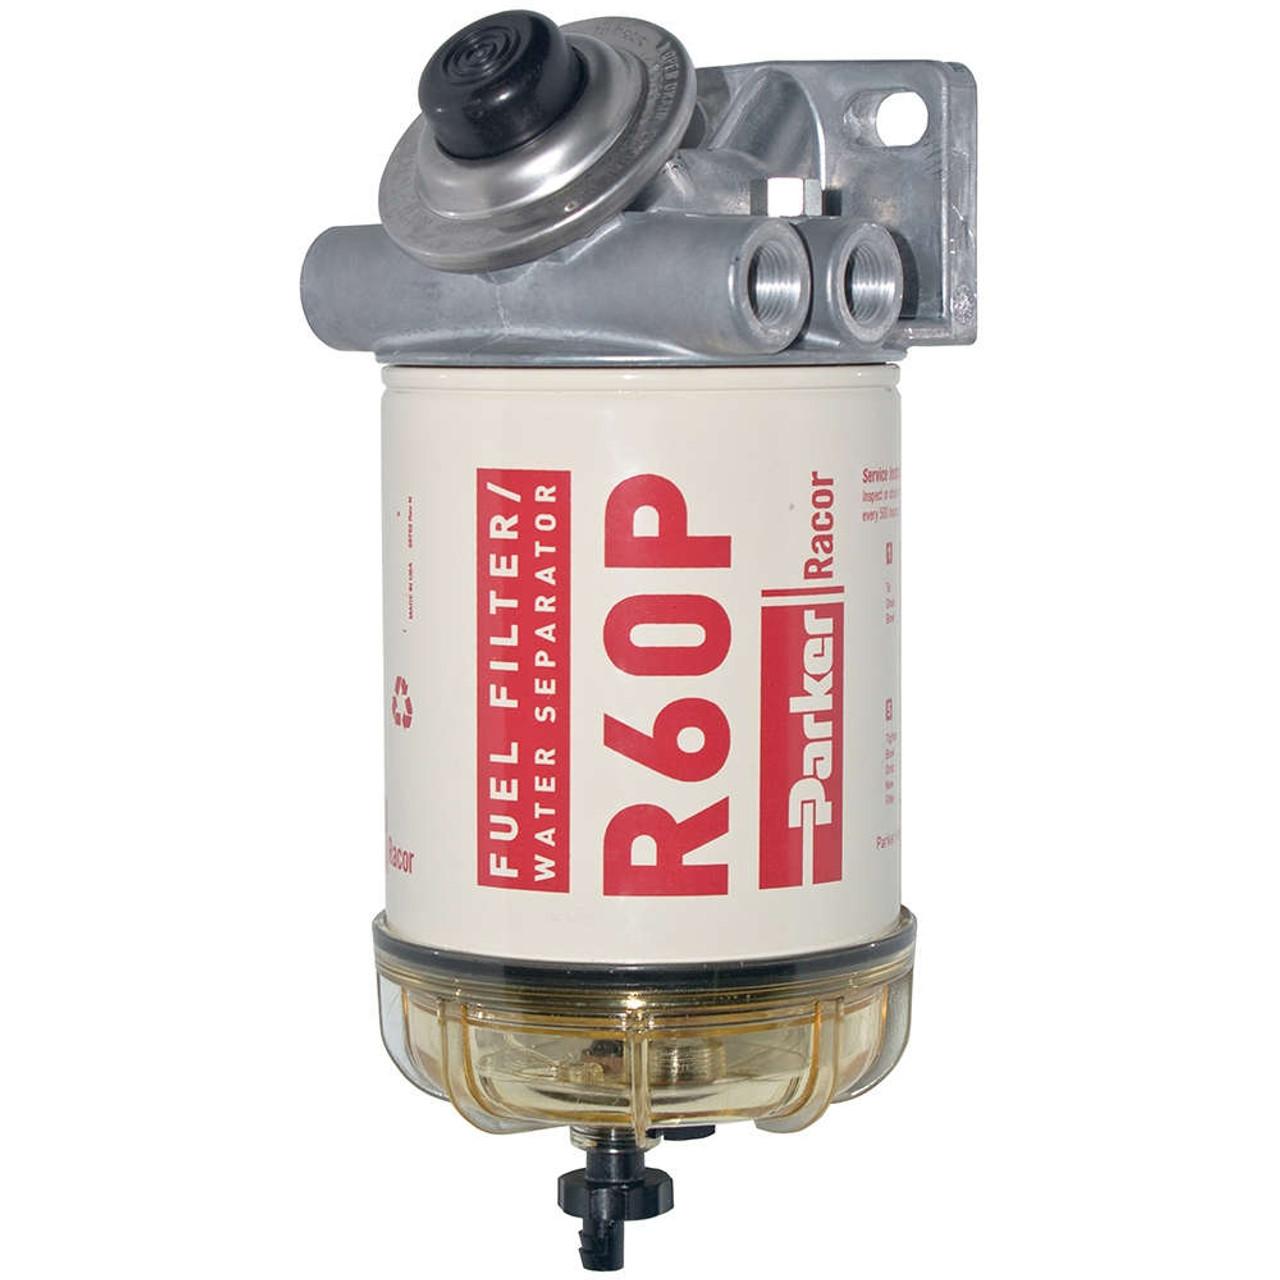 Racor 400 Series 60 GPH Diesel Spin-On Fuel Filter - 30 Micron - 6 Qty -  John M. Ellsworth Co. Inc.John M. Ellsworth